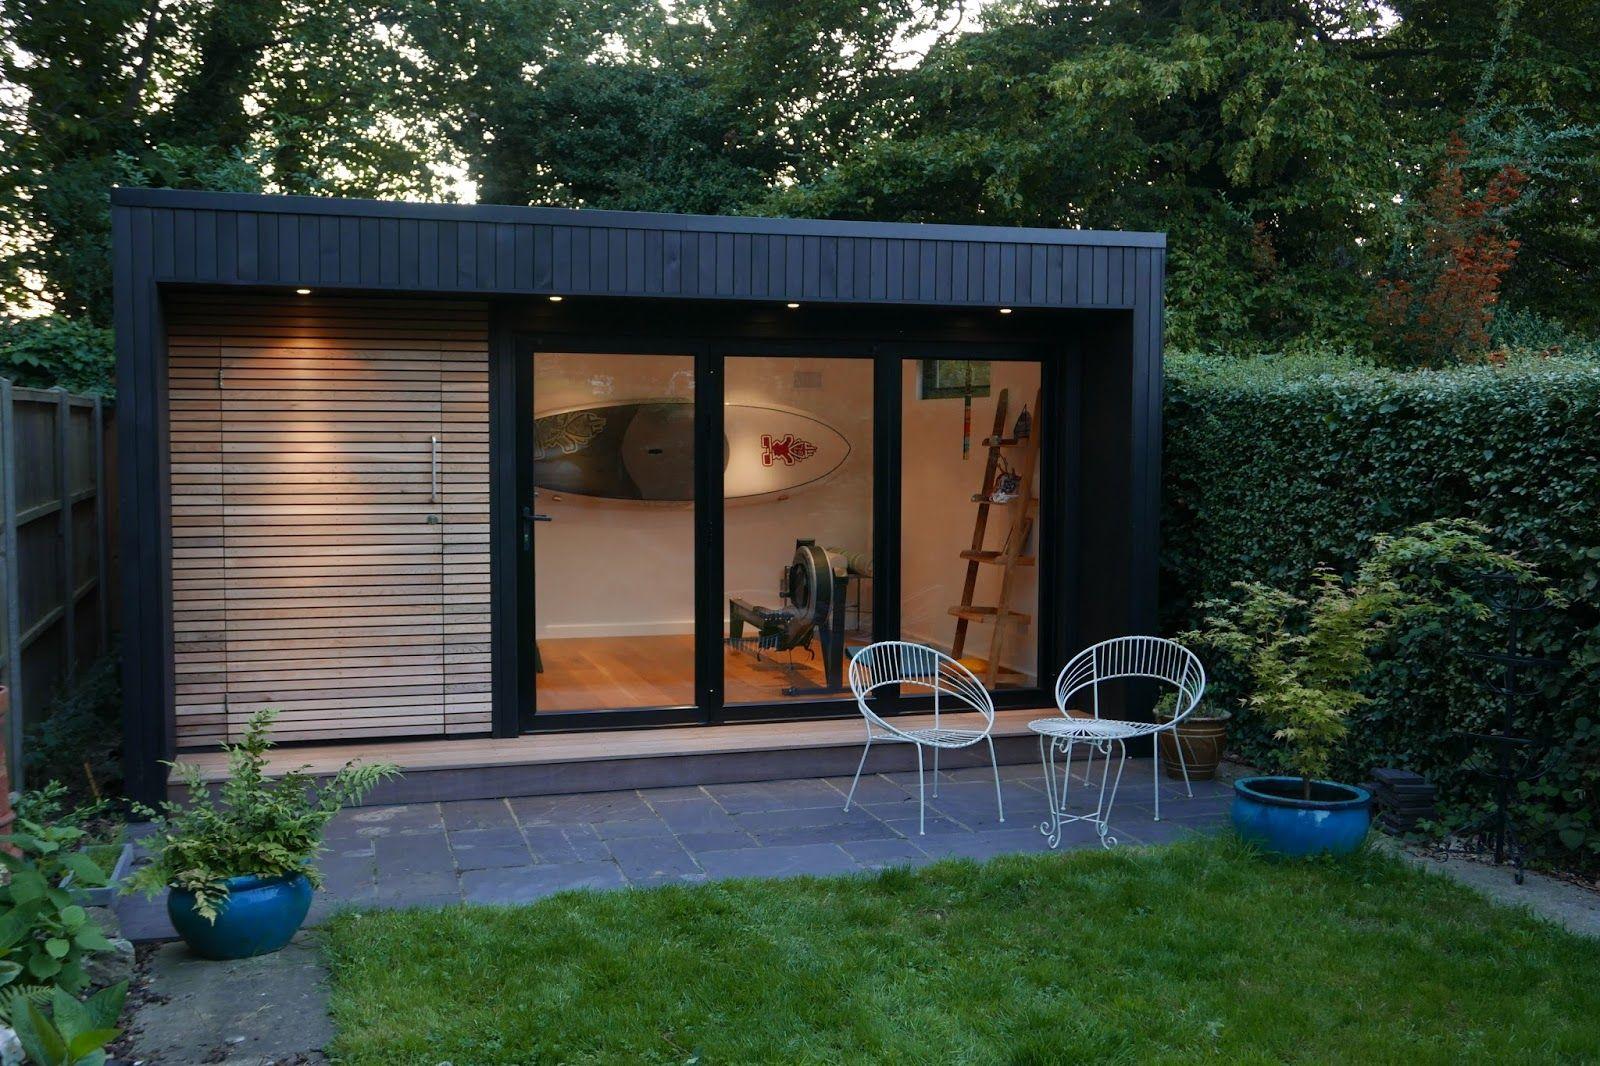 Lawn U0026 Garden:Nice Looking Outside Rooms Garden Design With White Frame  Iron Chair And Black Glass Sliding Door Idea Good Outside Rooms Garden  Design